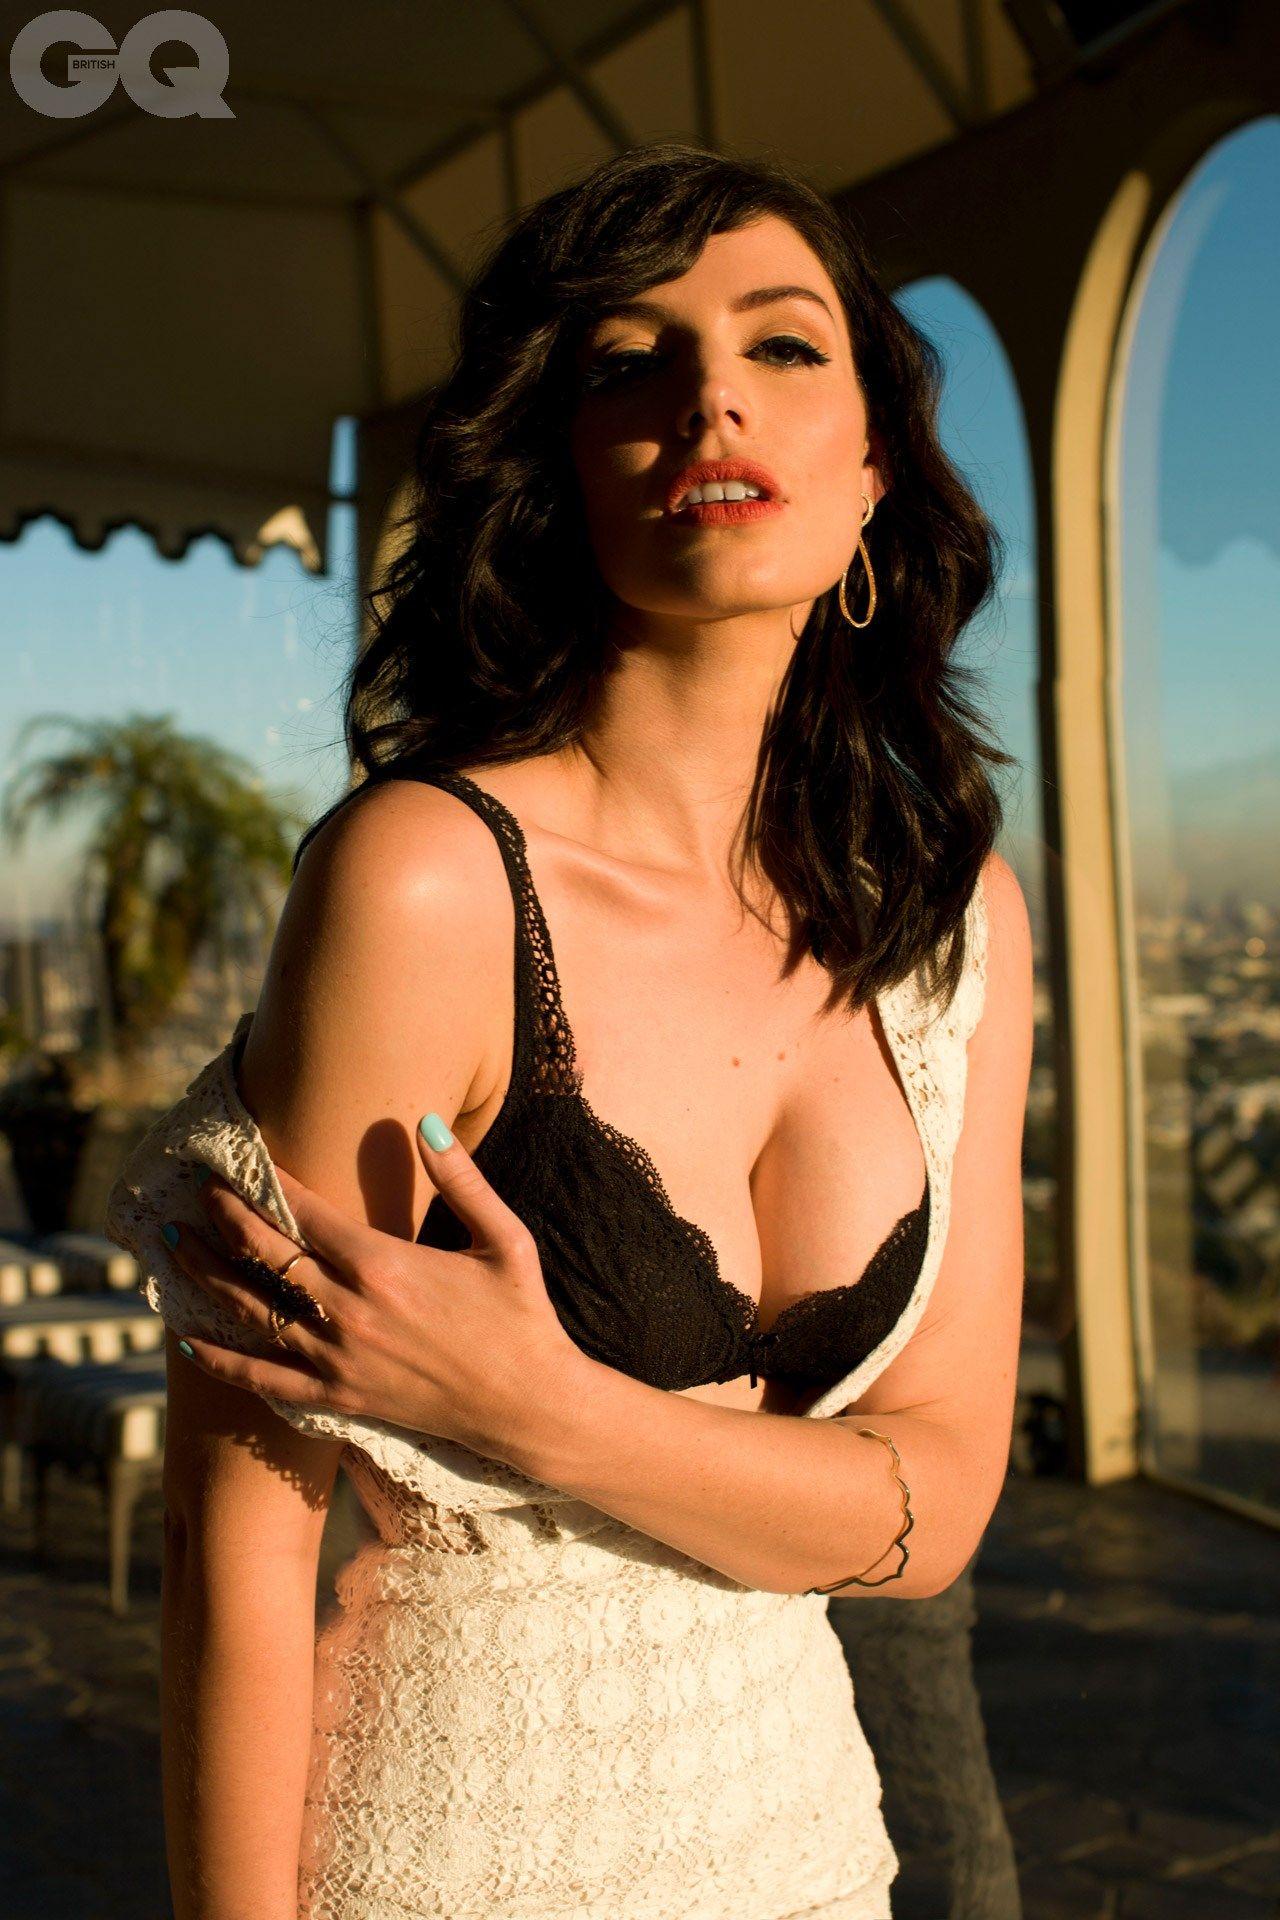 Porno Jessica Pare  nudes (98 pics), Instagram, underwear